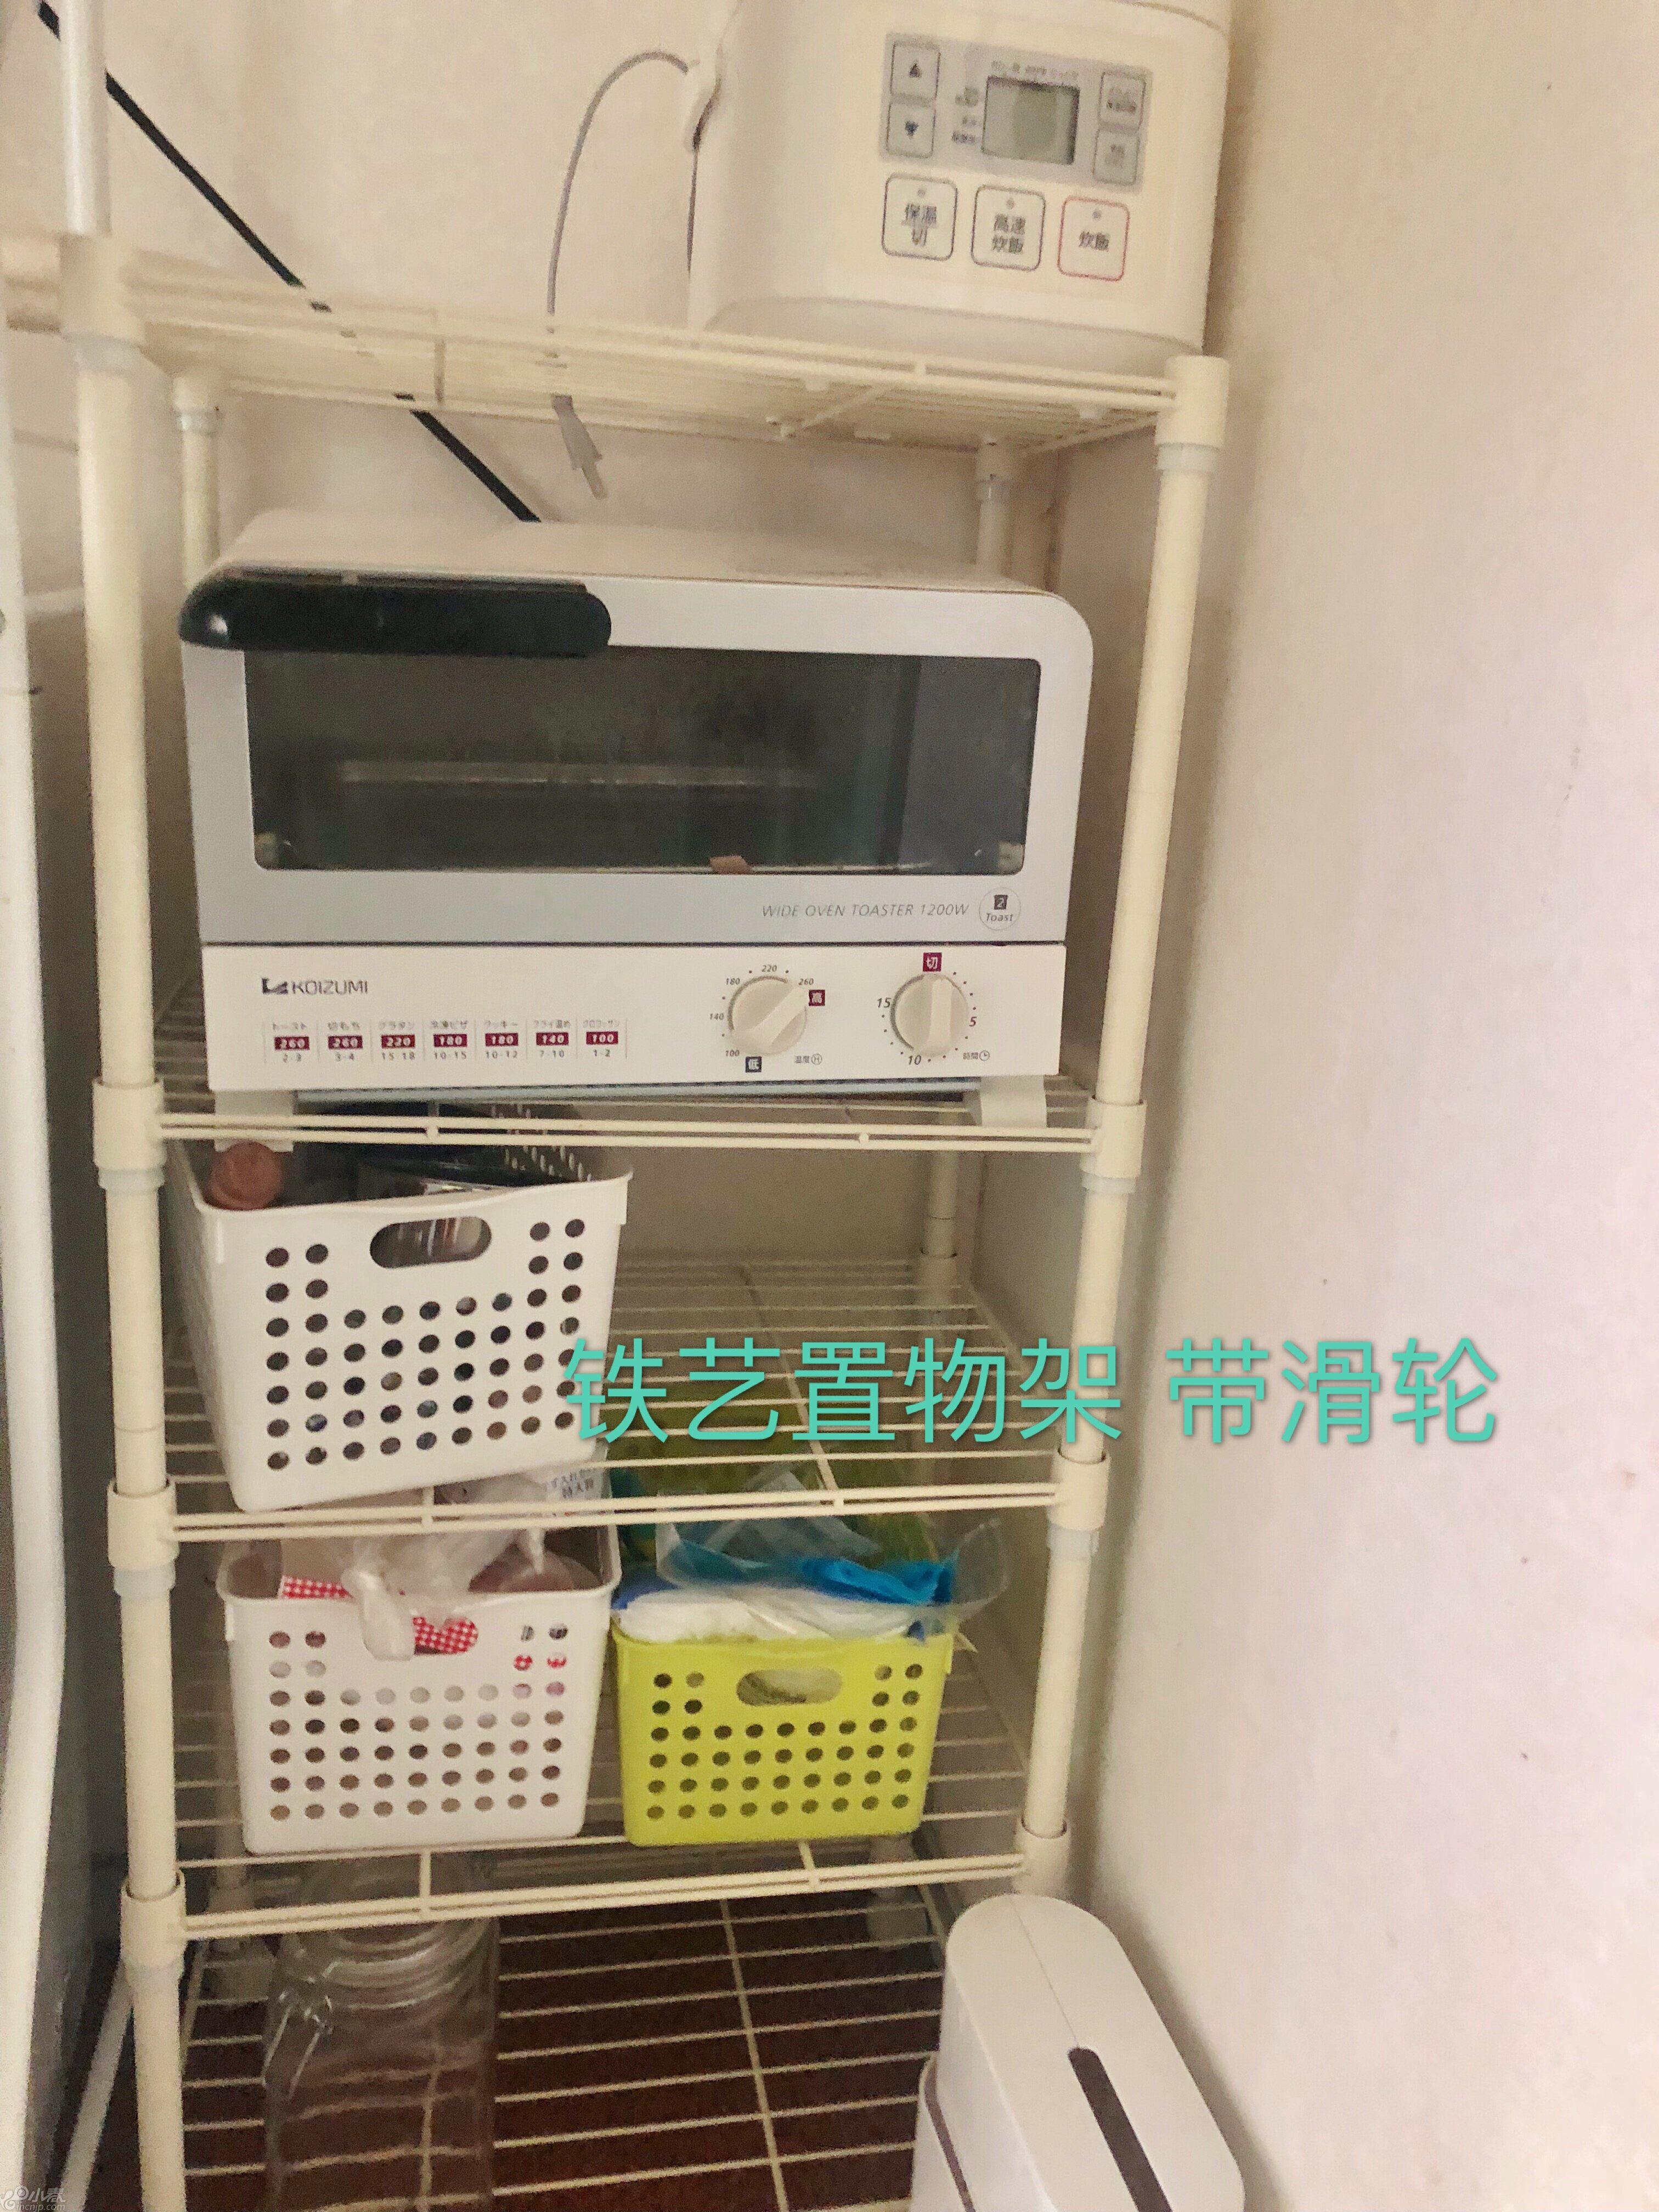 7768CFF0-8626-4D23-A041-AEB808DCDC64.jpeg